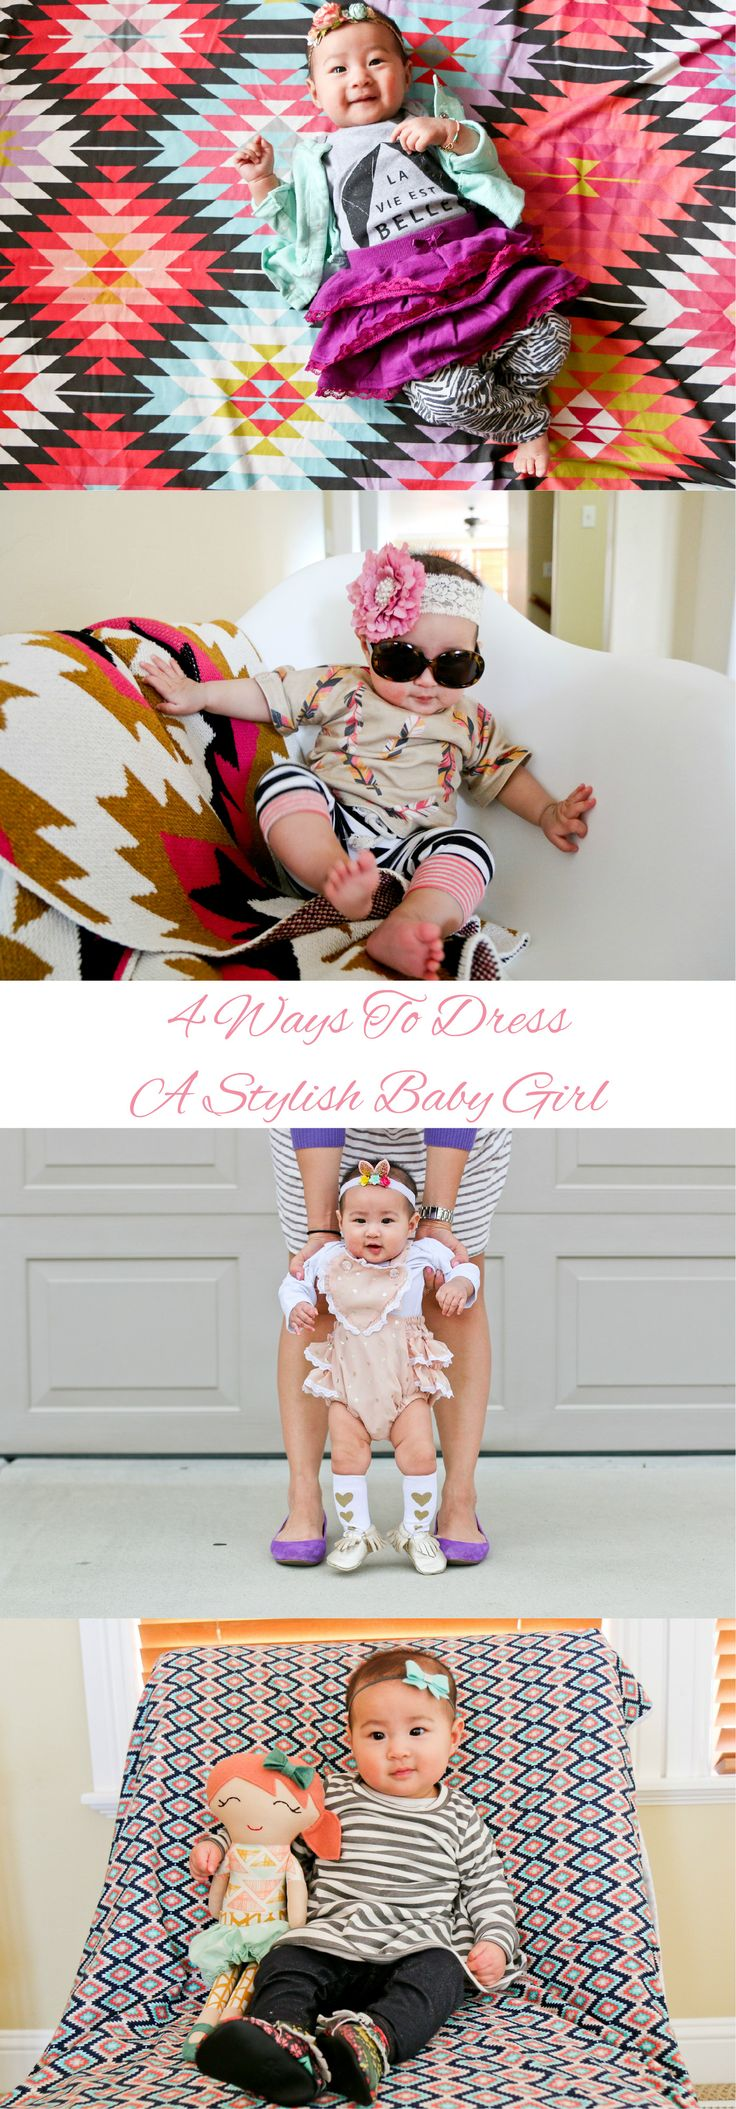 4 Ways To Dress A Stylish Baby Girl